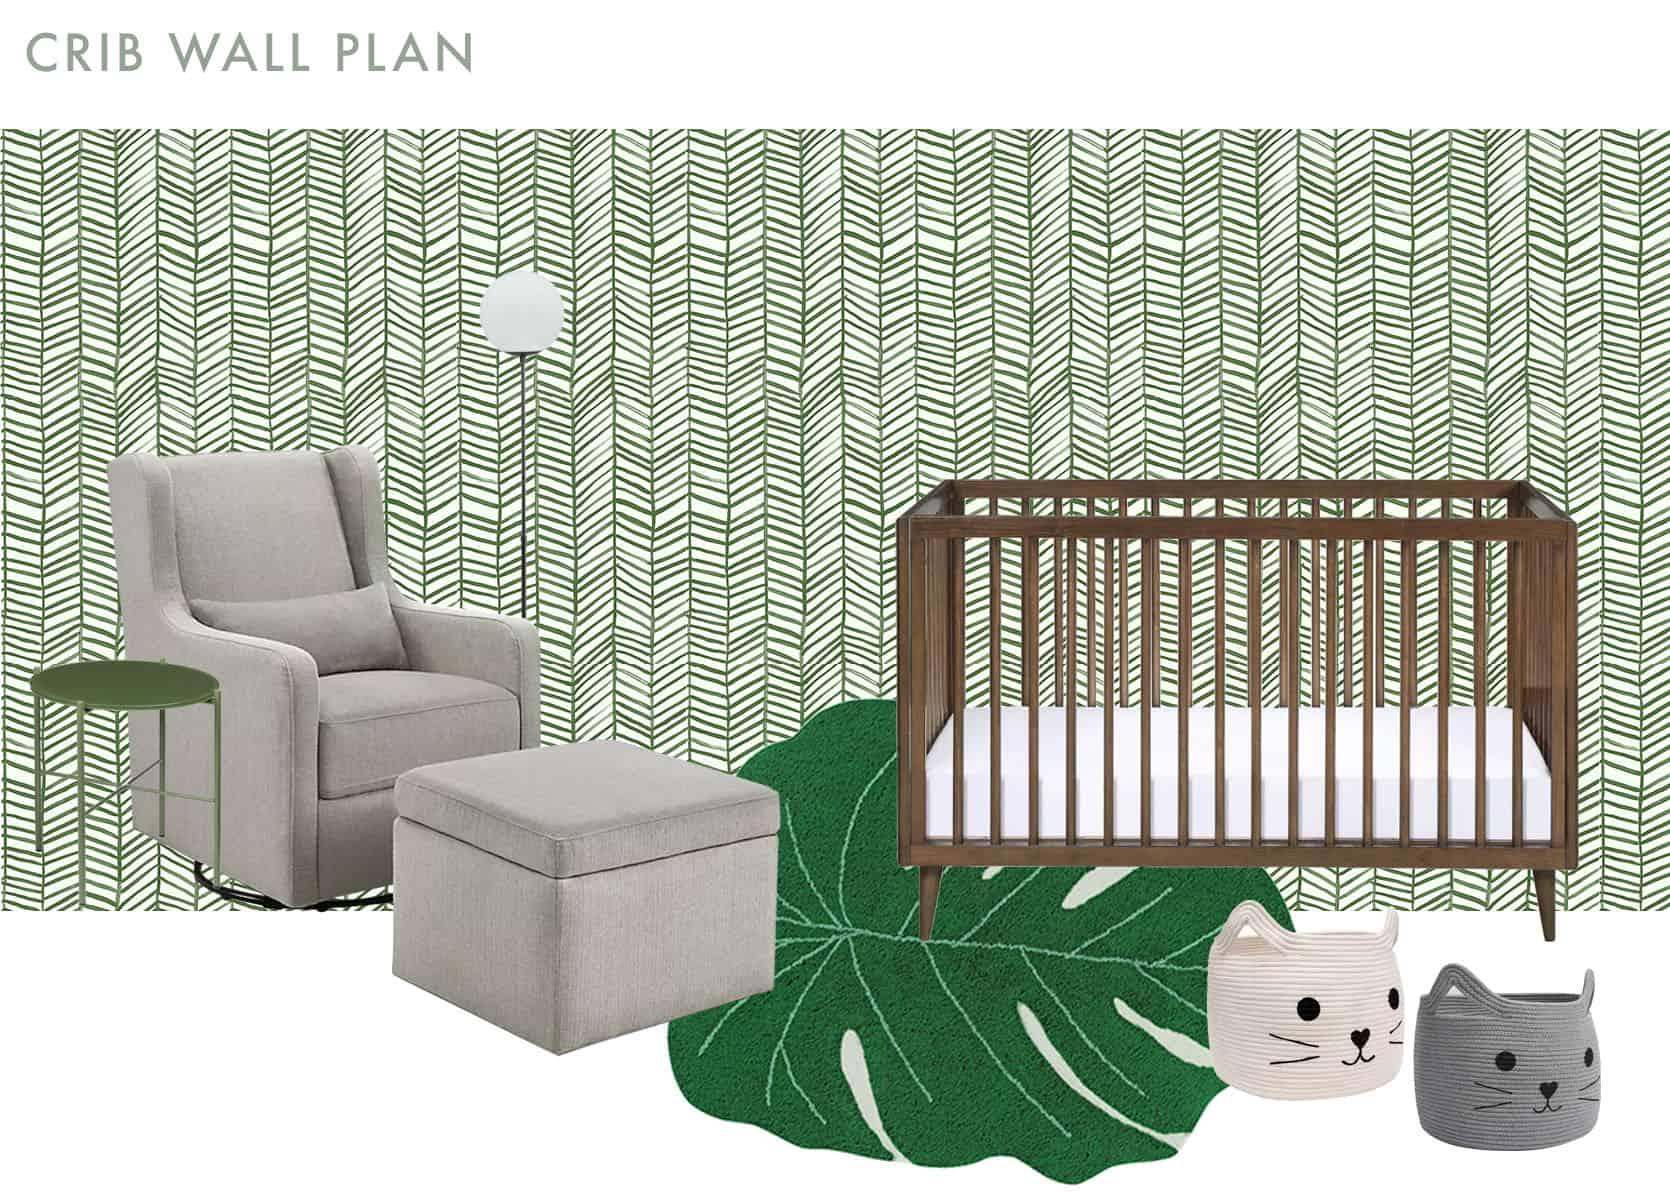 Emily Henderson Cailtin Nursery MOTO Update Crib Wall